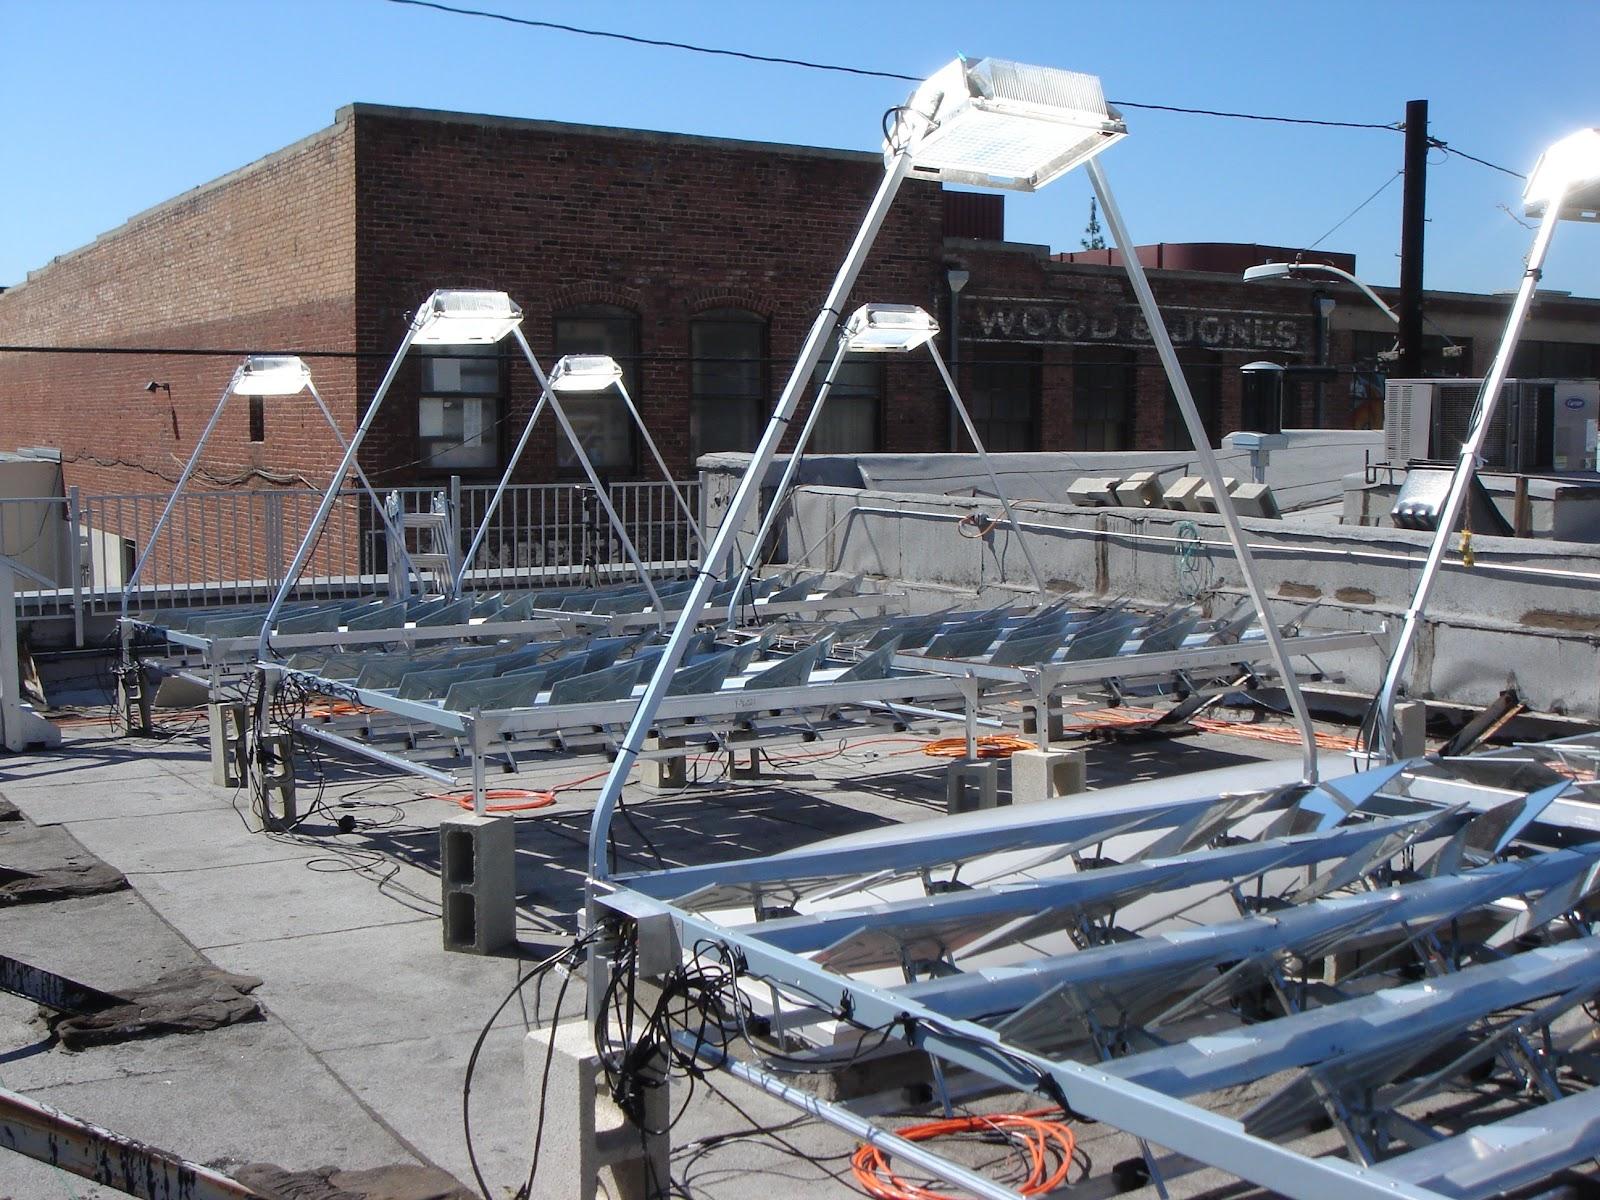 Commercial Solar Array, Wikimedia